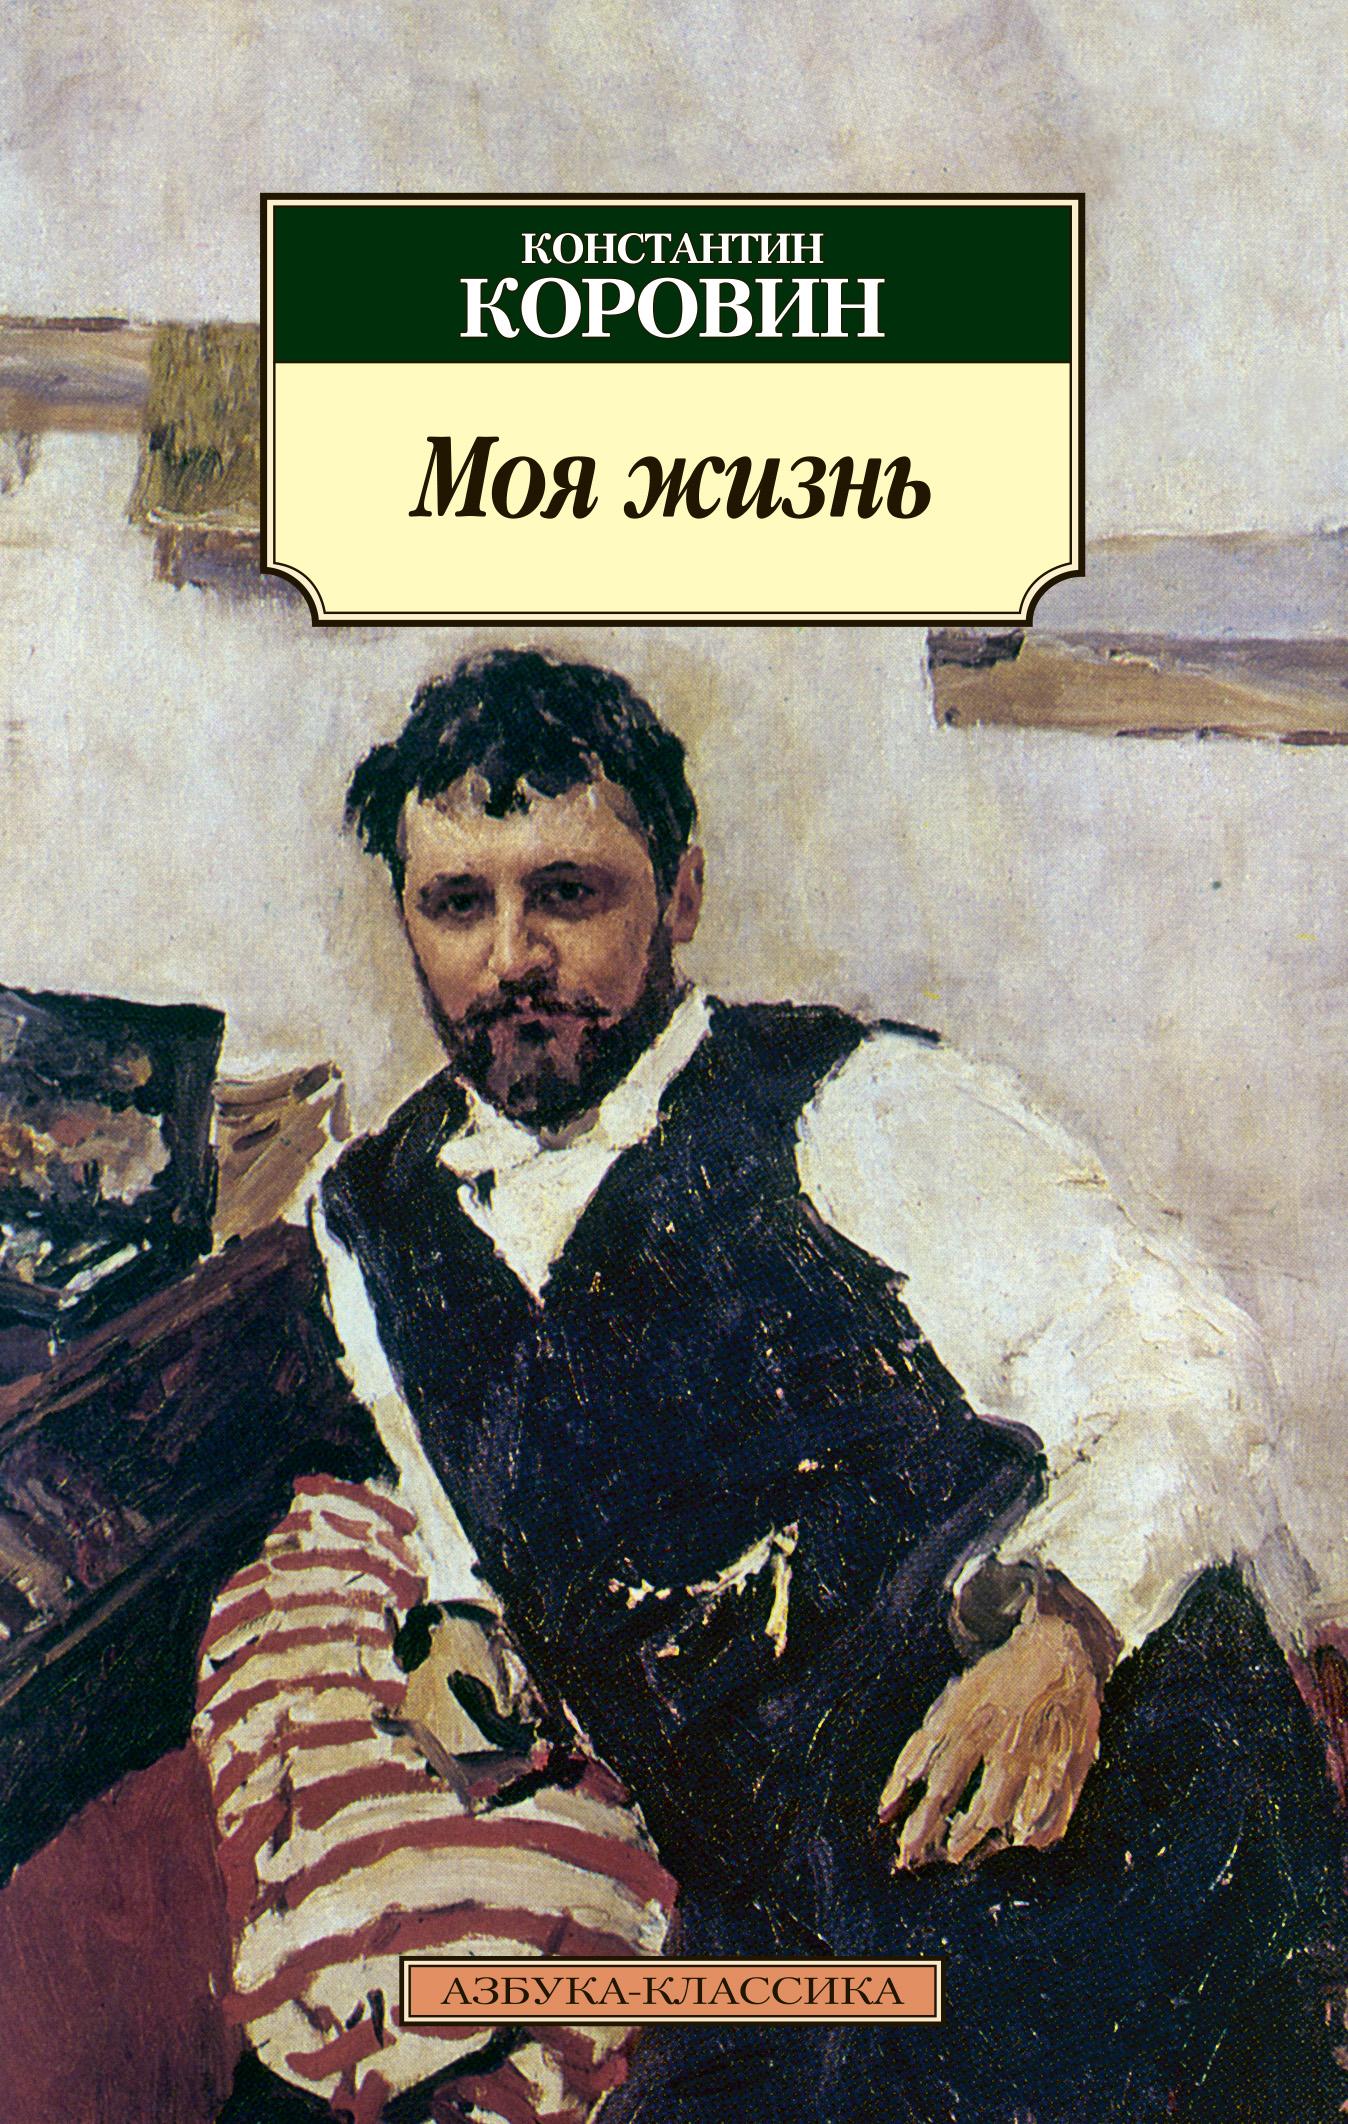 Константин Коровин Моя жизнь (сборник)